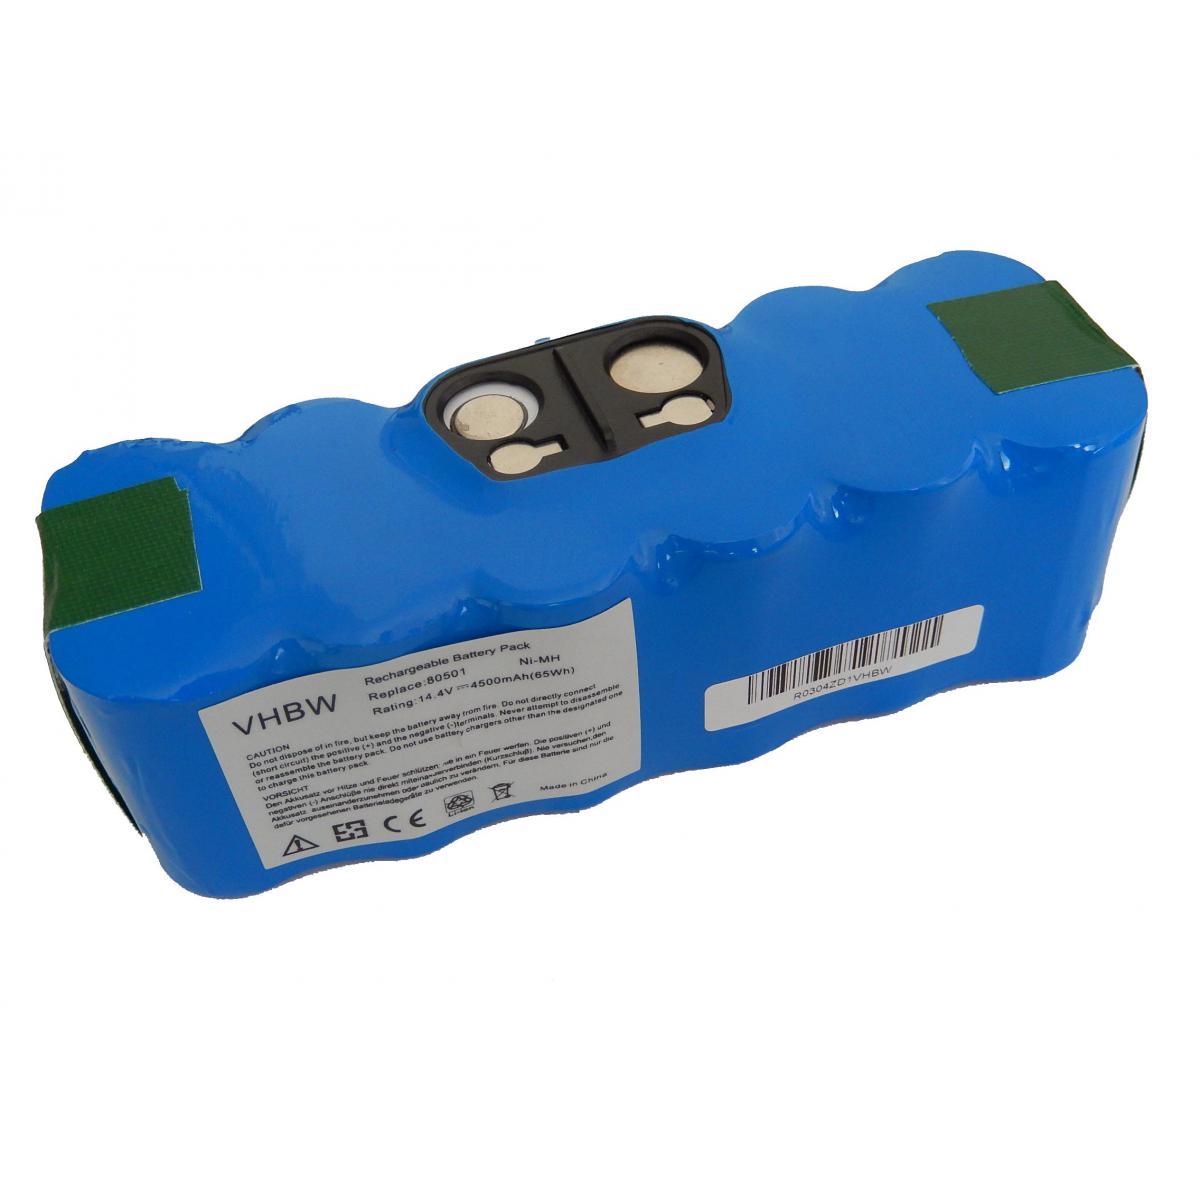 Vhbw vhbw batterie Ni-MH 4500mAh (14.4V) compatible avec iRobot Roomba 620, 625, 630, 650 remplace 11702, GD-Roomba-500, VAC-